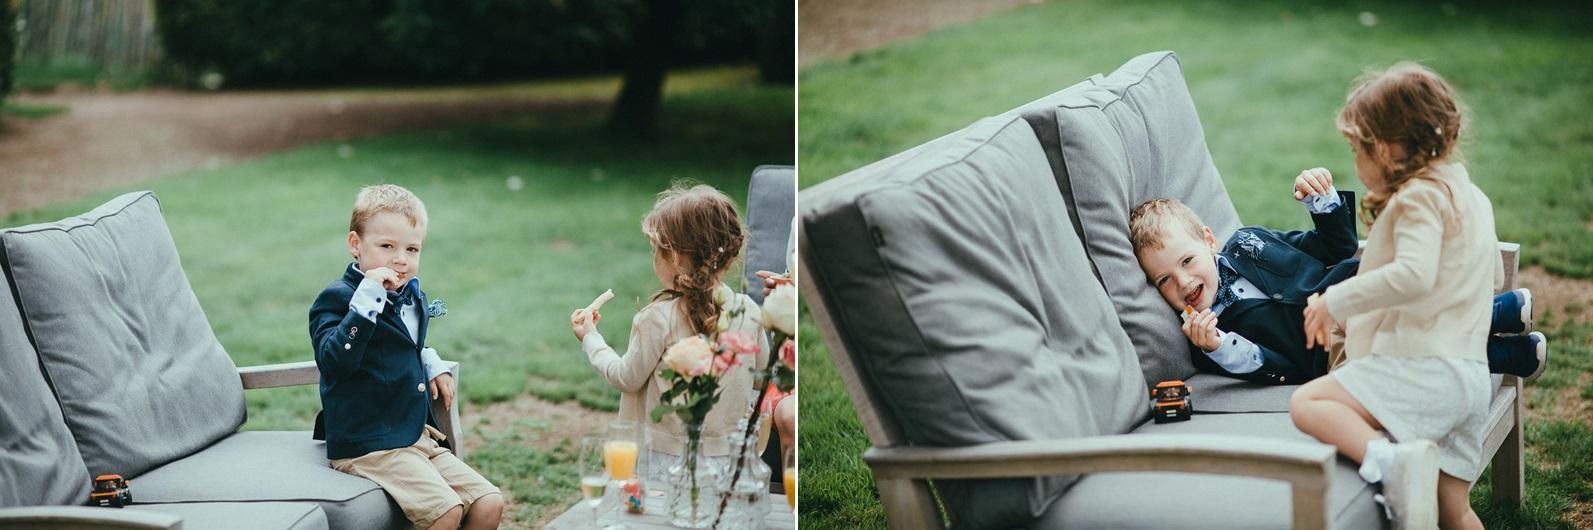 chateau-wedding-photography (83).jpg